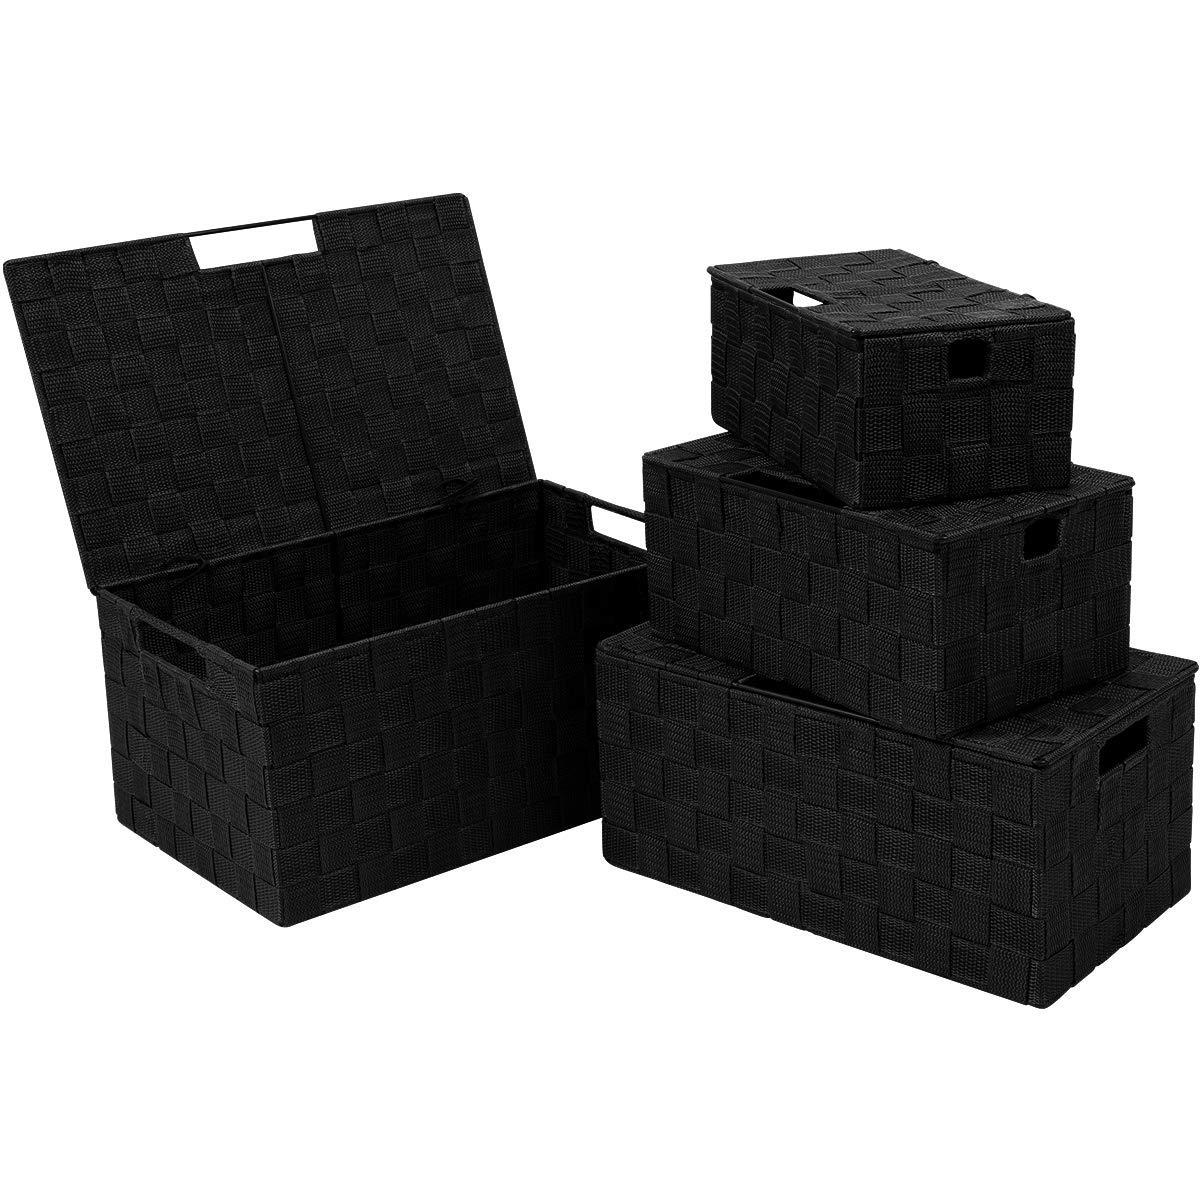 KEDSUM Woven Storage Baskets Boxes Bins, Storage Baskets with Lids Storage Cube Bins Closet Storage Baskets, Woven Organizer Baskets Built-in Carry Handles (Black Set of 4) by KEDSUM